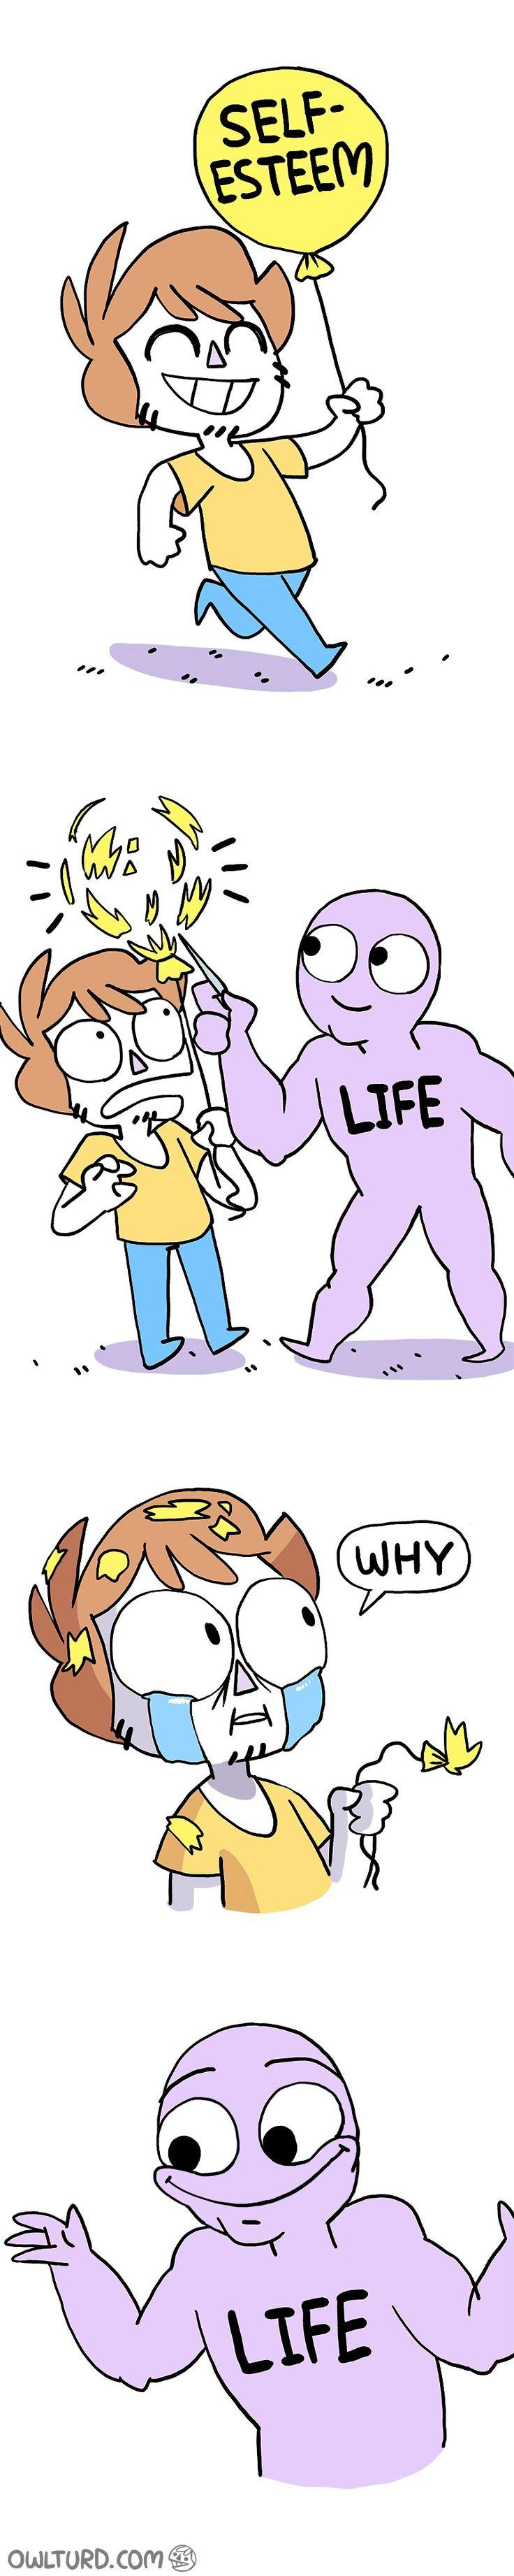 Life wants to F%ck us all, just for kicks! : |  via OwlTurd.com